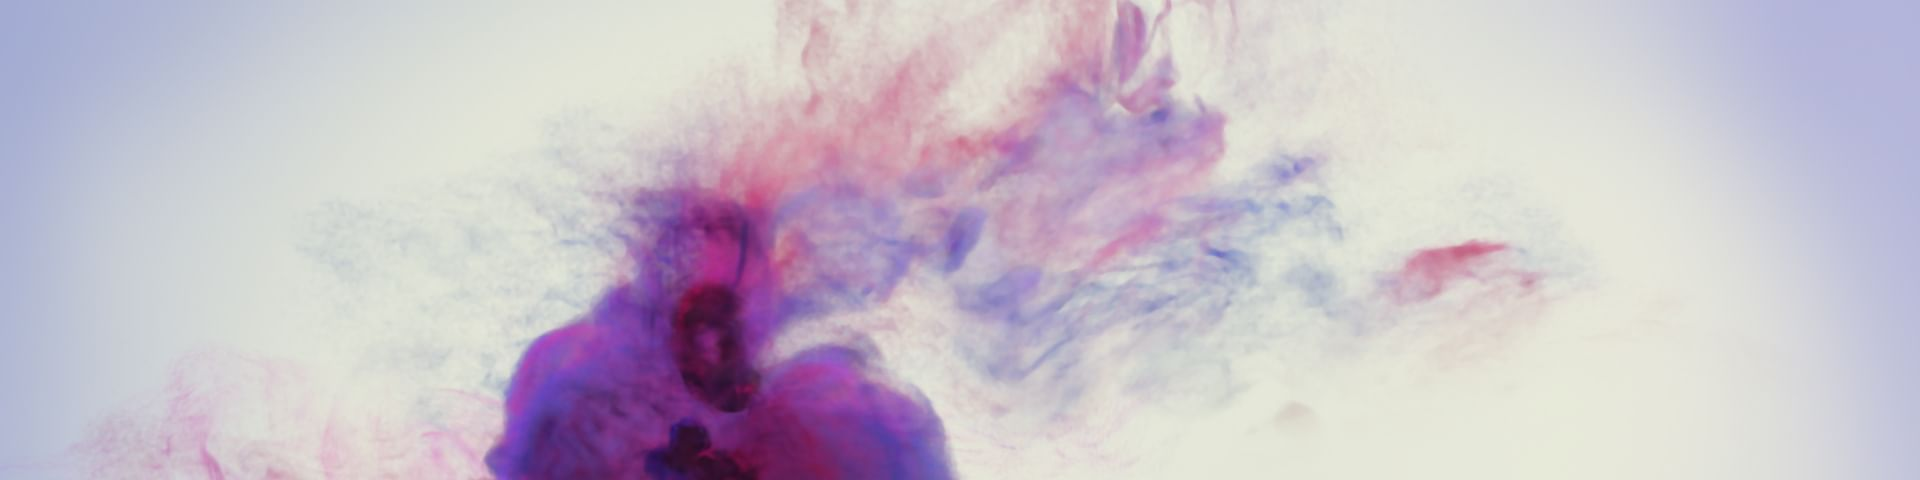 UG99 : récoltes en péril